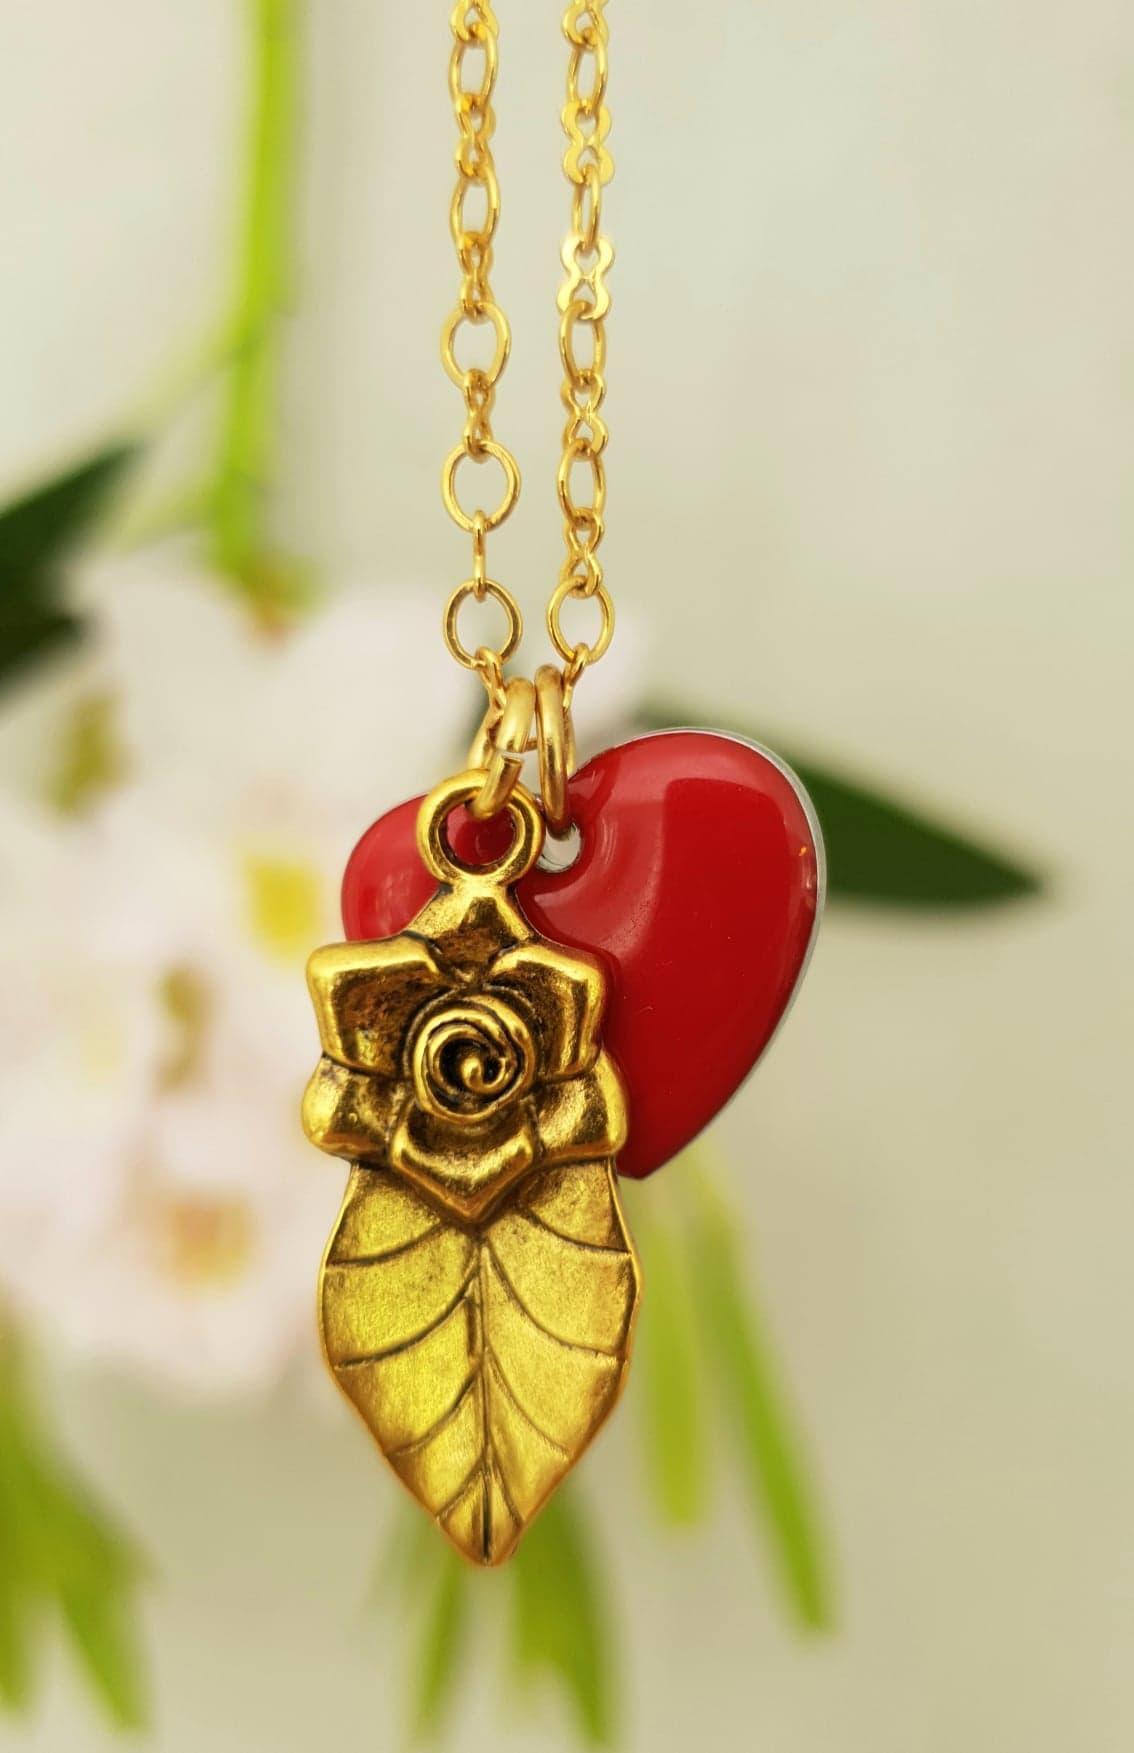 Kort kæde med hjerte og rose